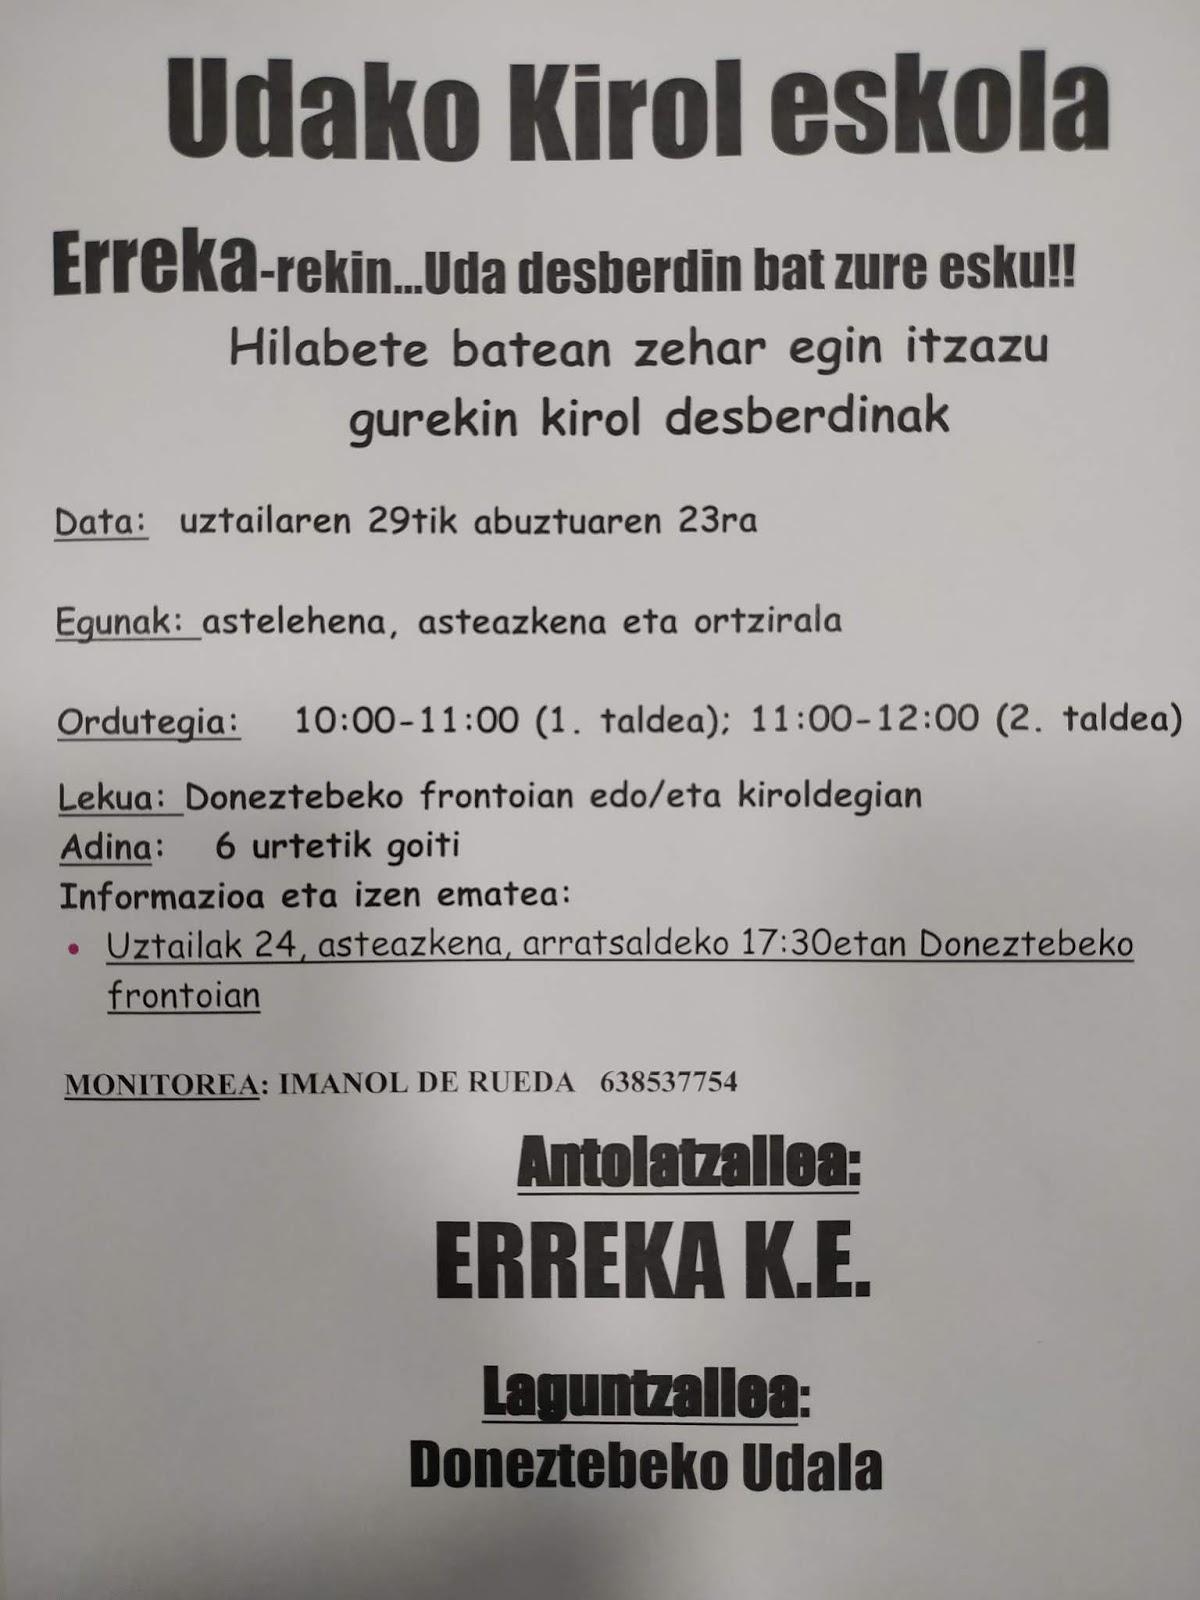 UDAKO KIROL ESKOLA